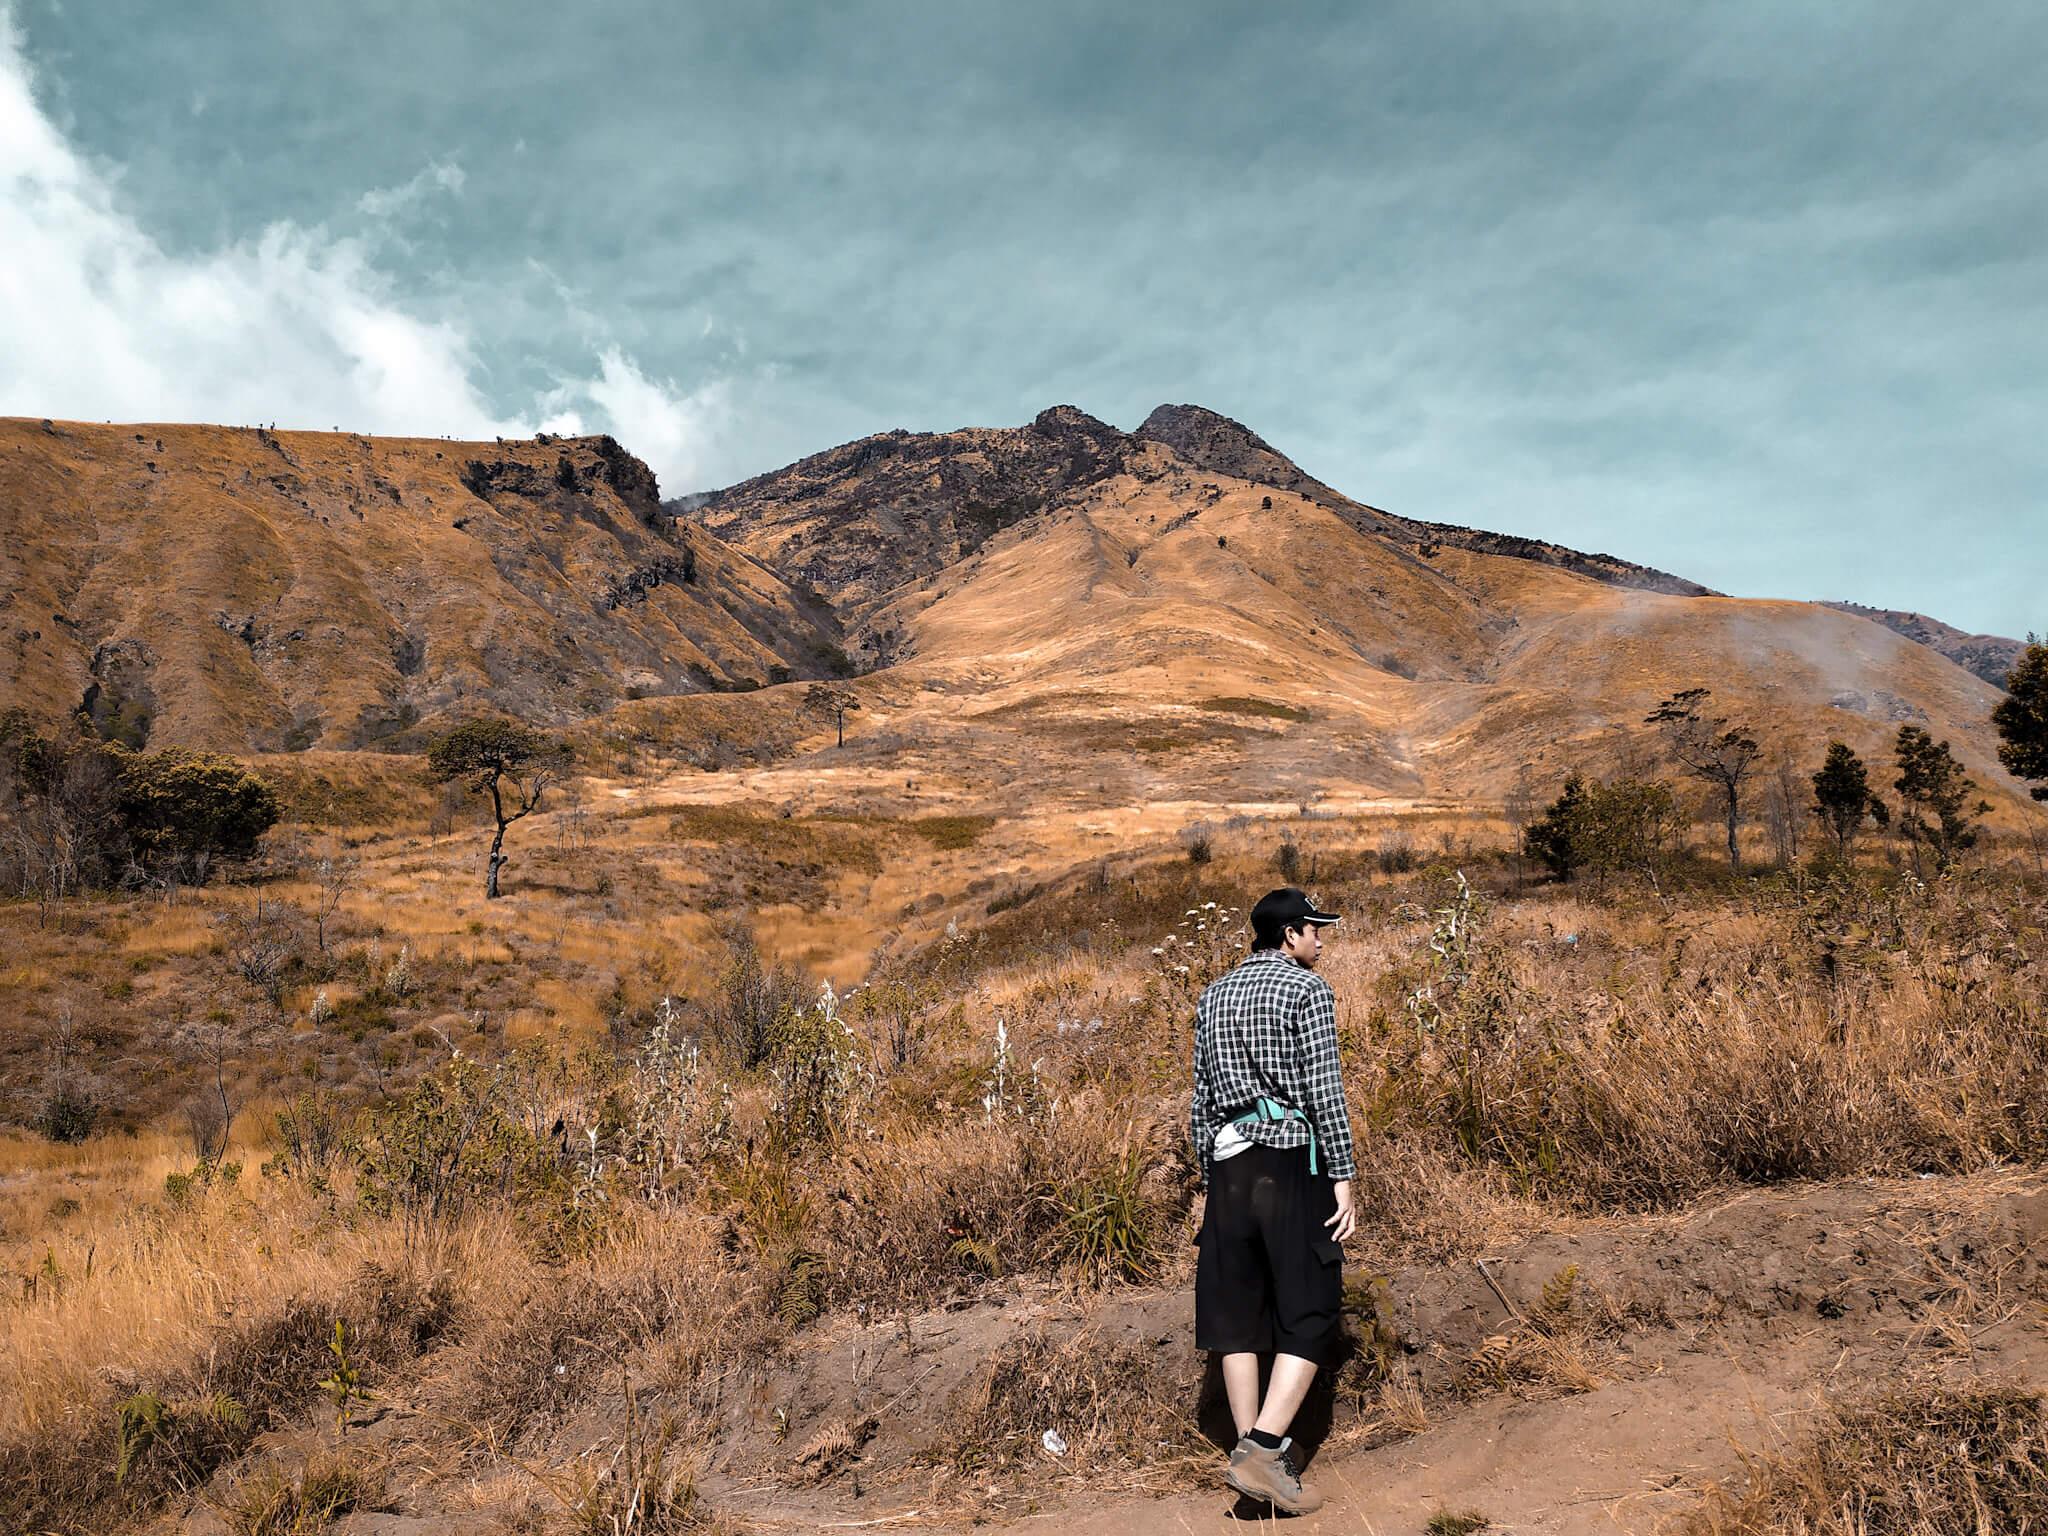 Biaya mendaki gunung sumbing